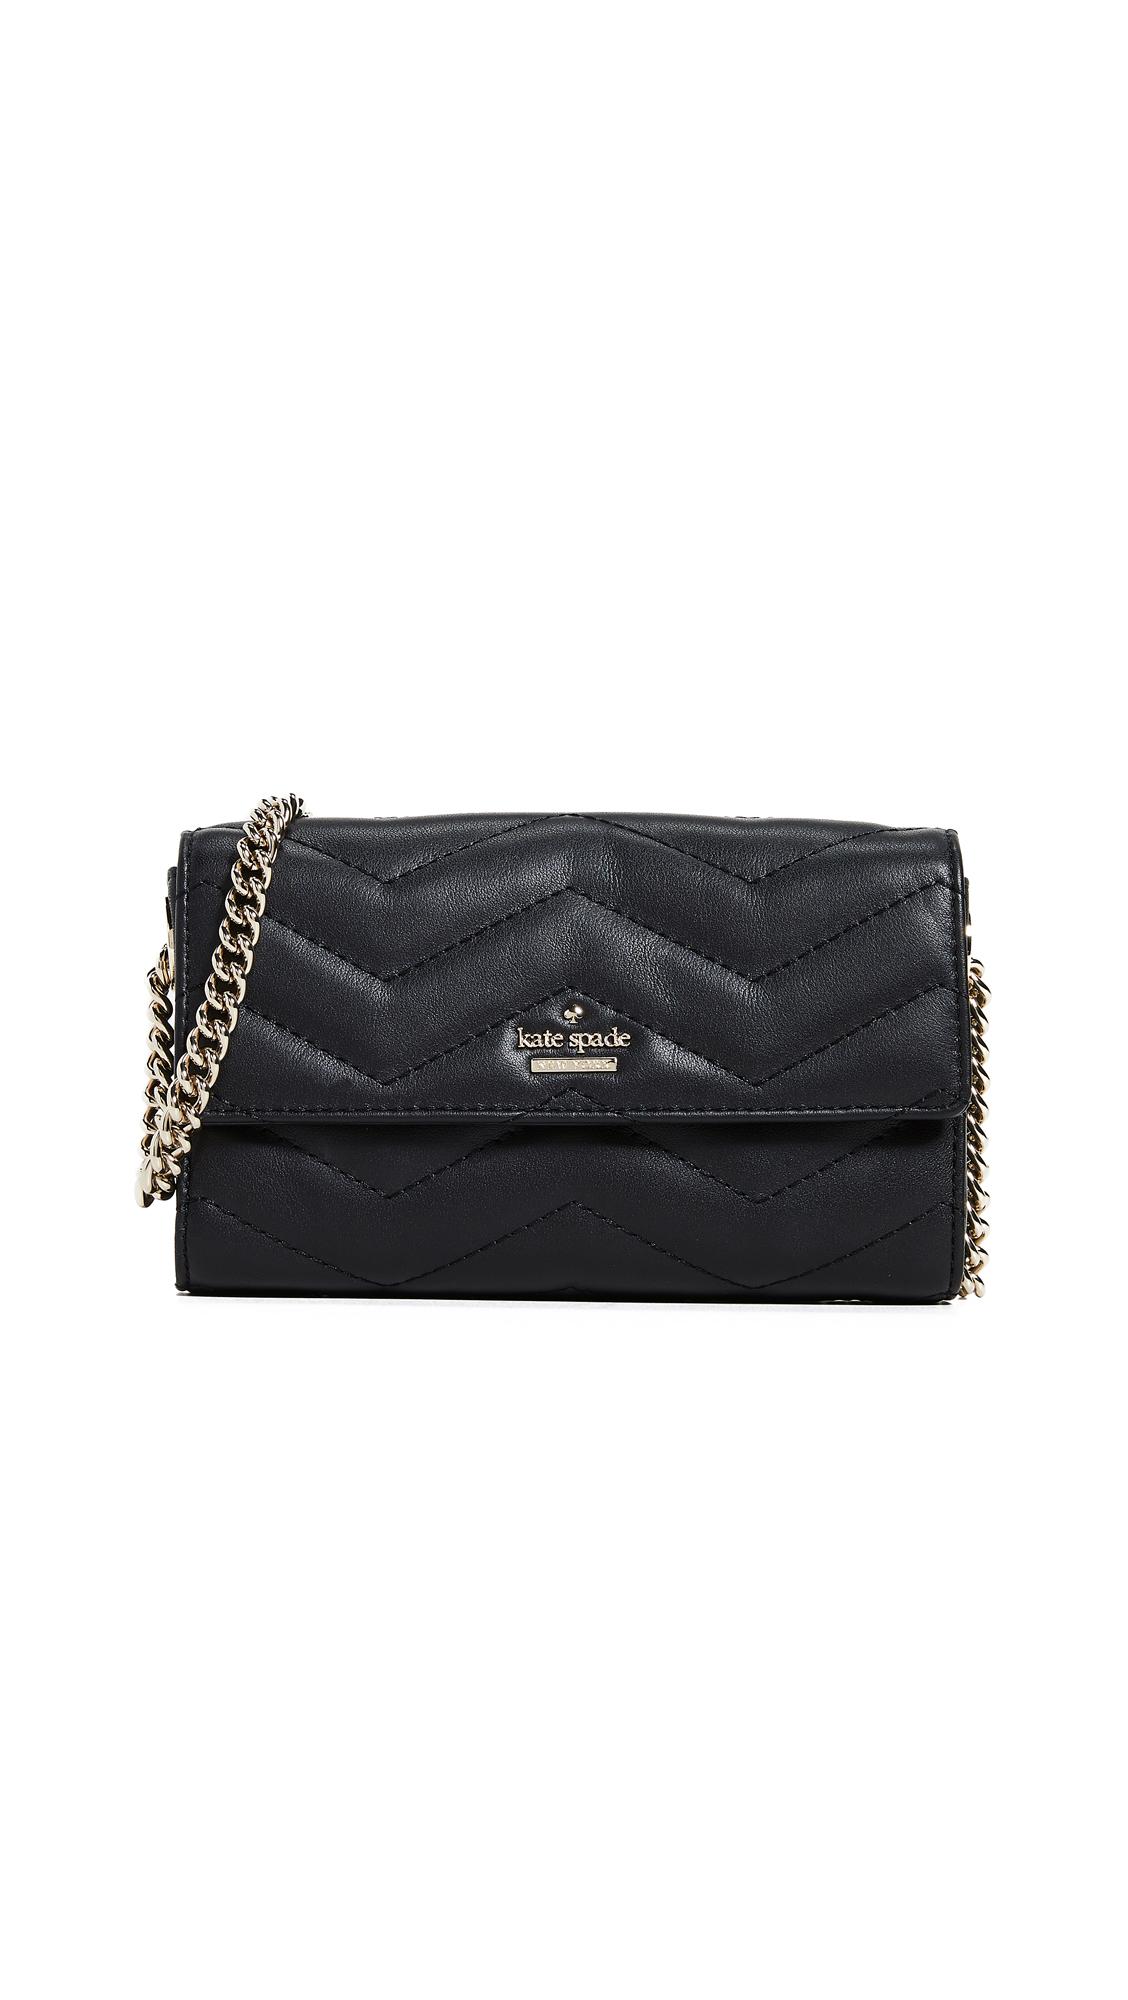 Reese Park Delilah Convertible Belt Bag, Black